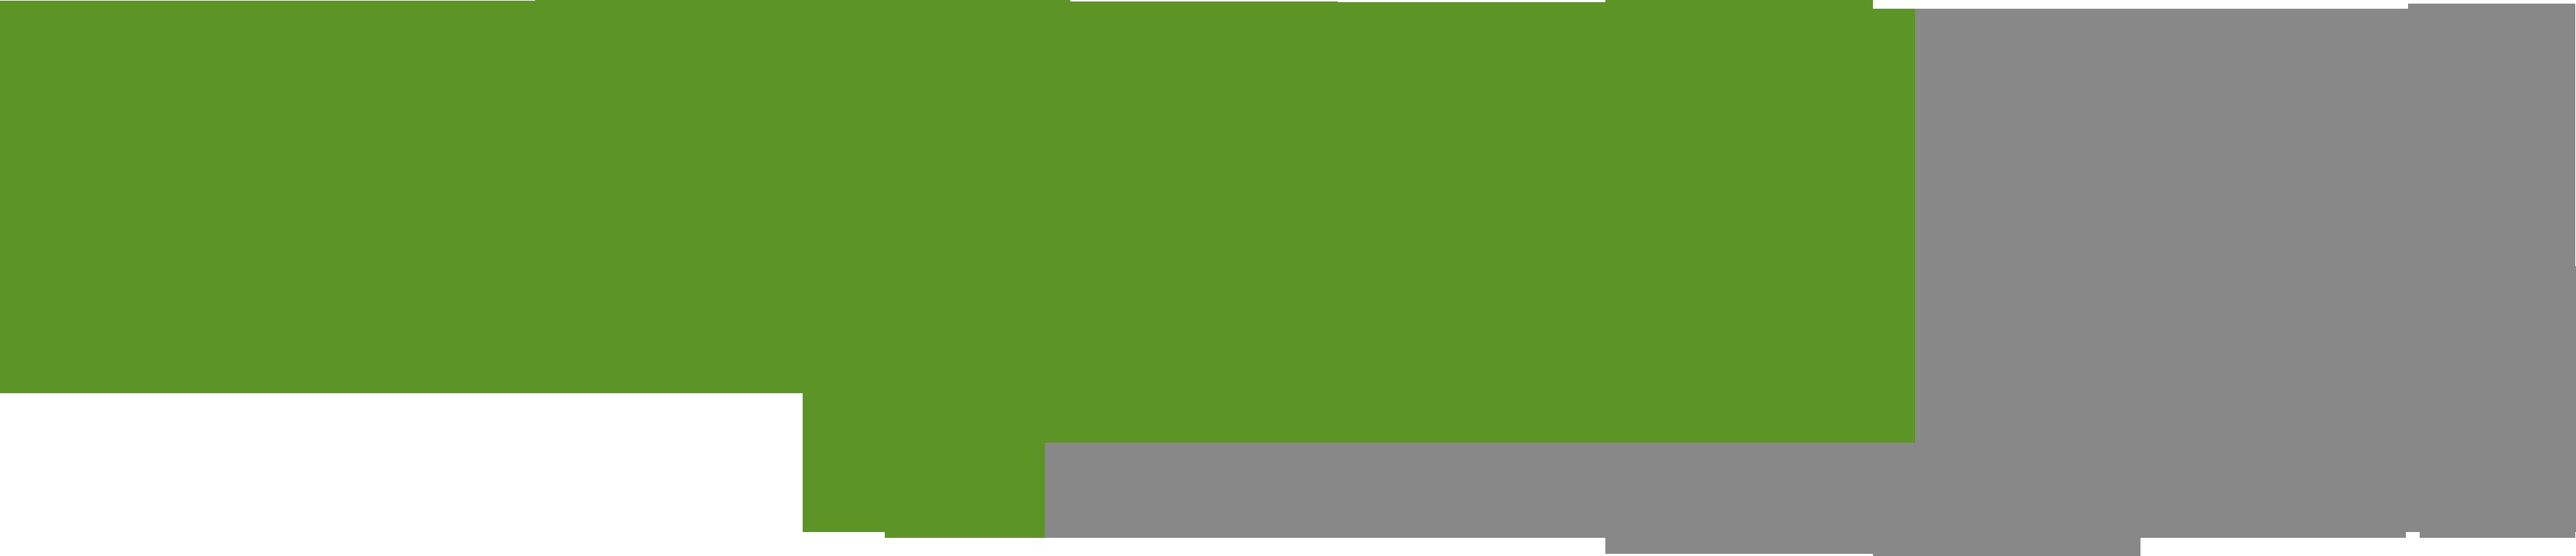 Logo isproNG Instandhaltungssoftware